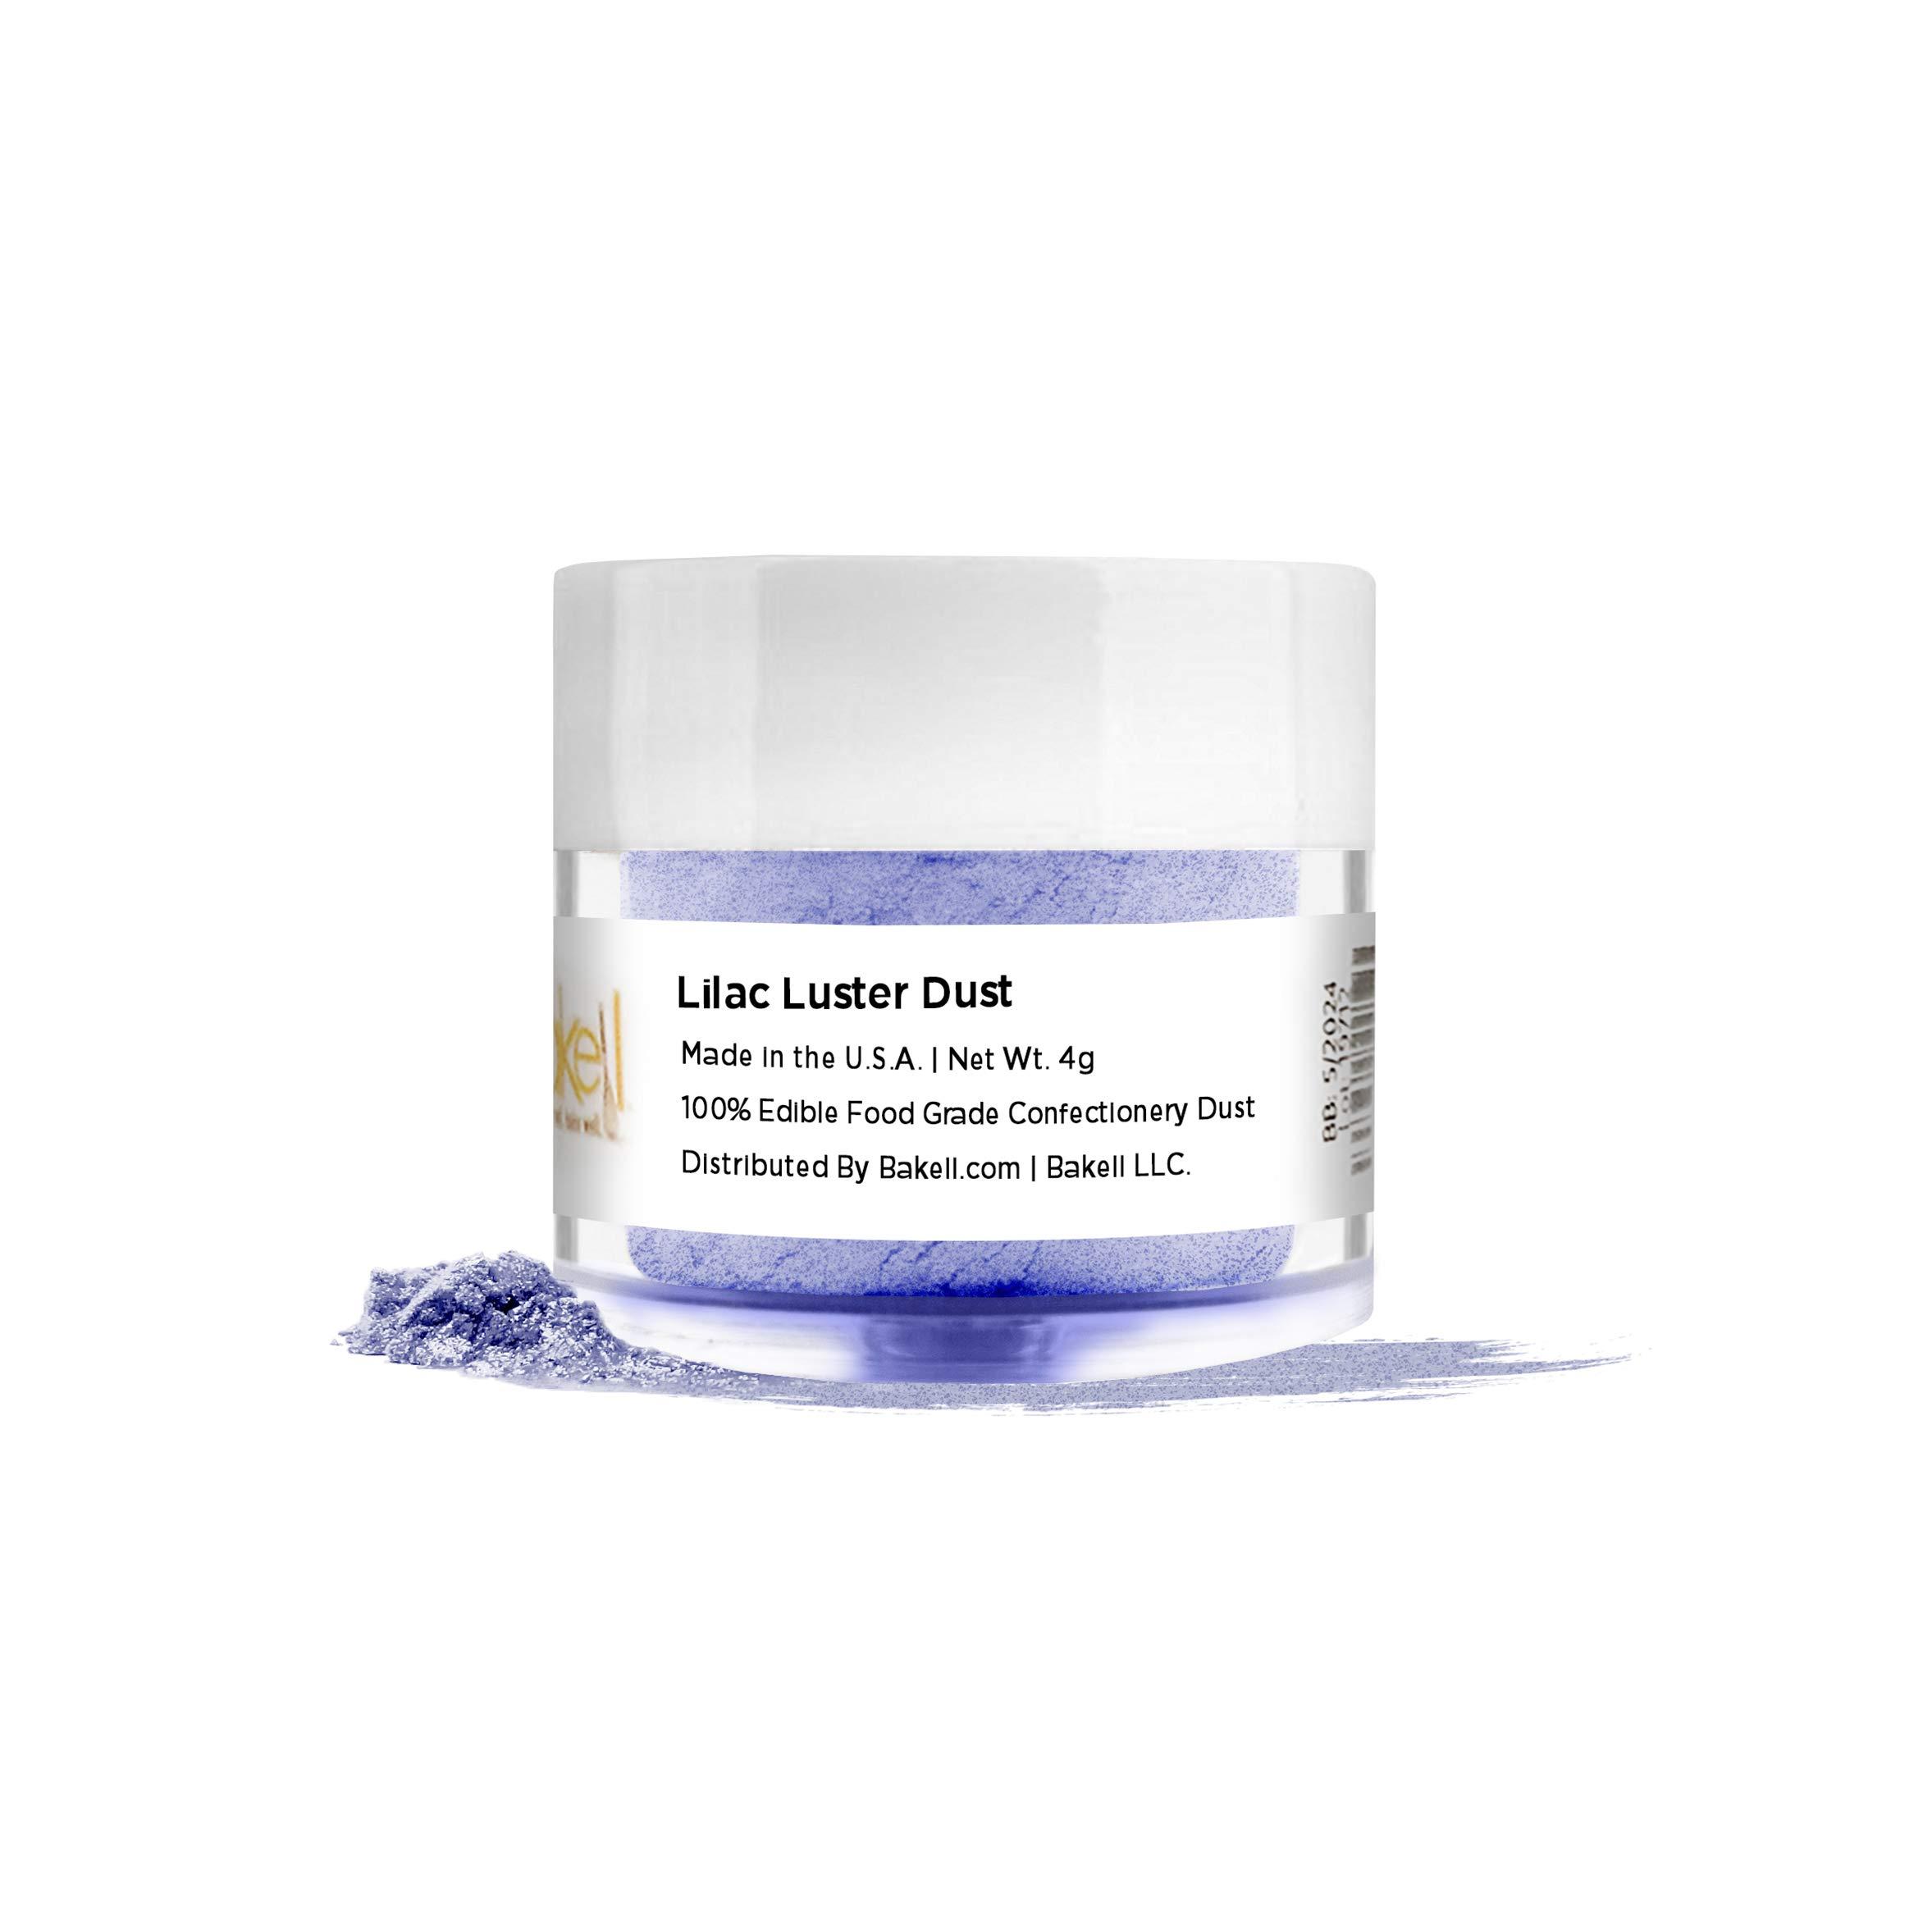 BAKELL Lilac Purple Edible Luster Dust & Paint, 4 Gram | LUSTER DUST Edible Powder | KOSHER Certified Paint, Powder & Dust | 100% Edible & Food Grade| Cakes, Cupcakes, Vegan Dust (Lilac Purple)